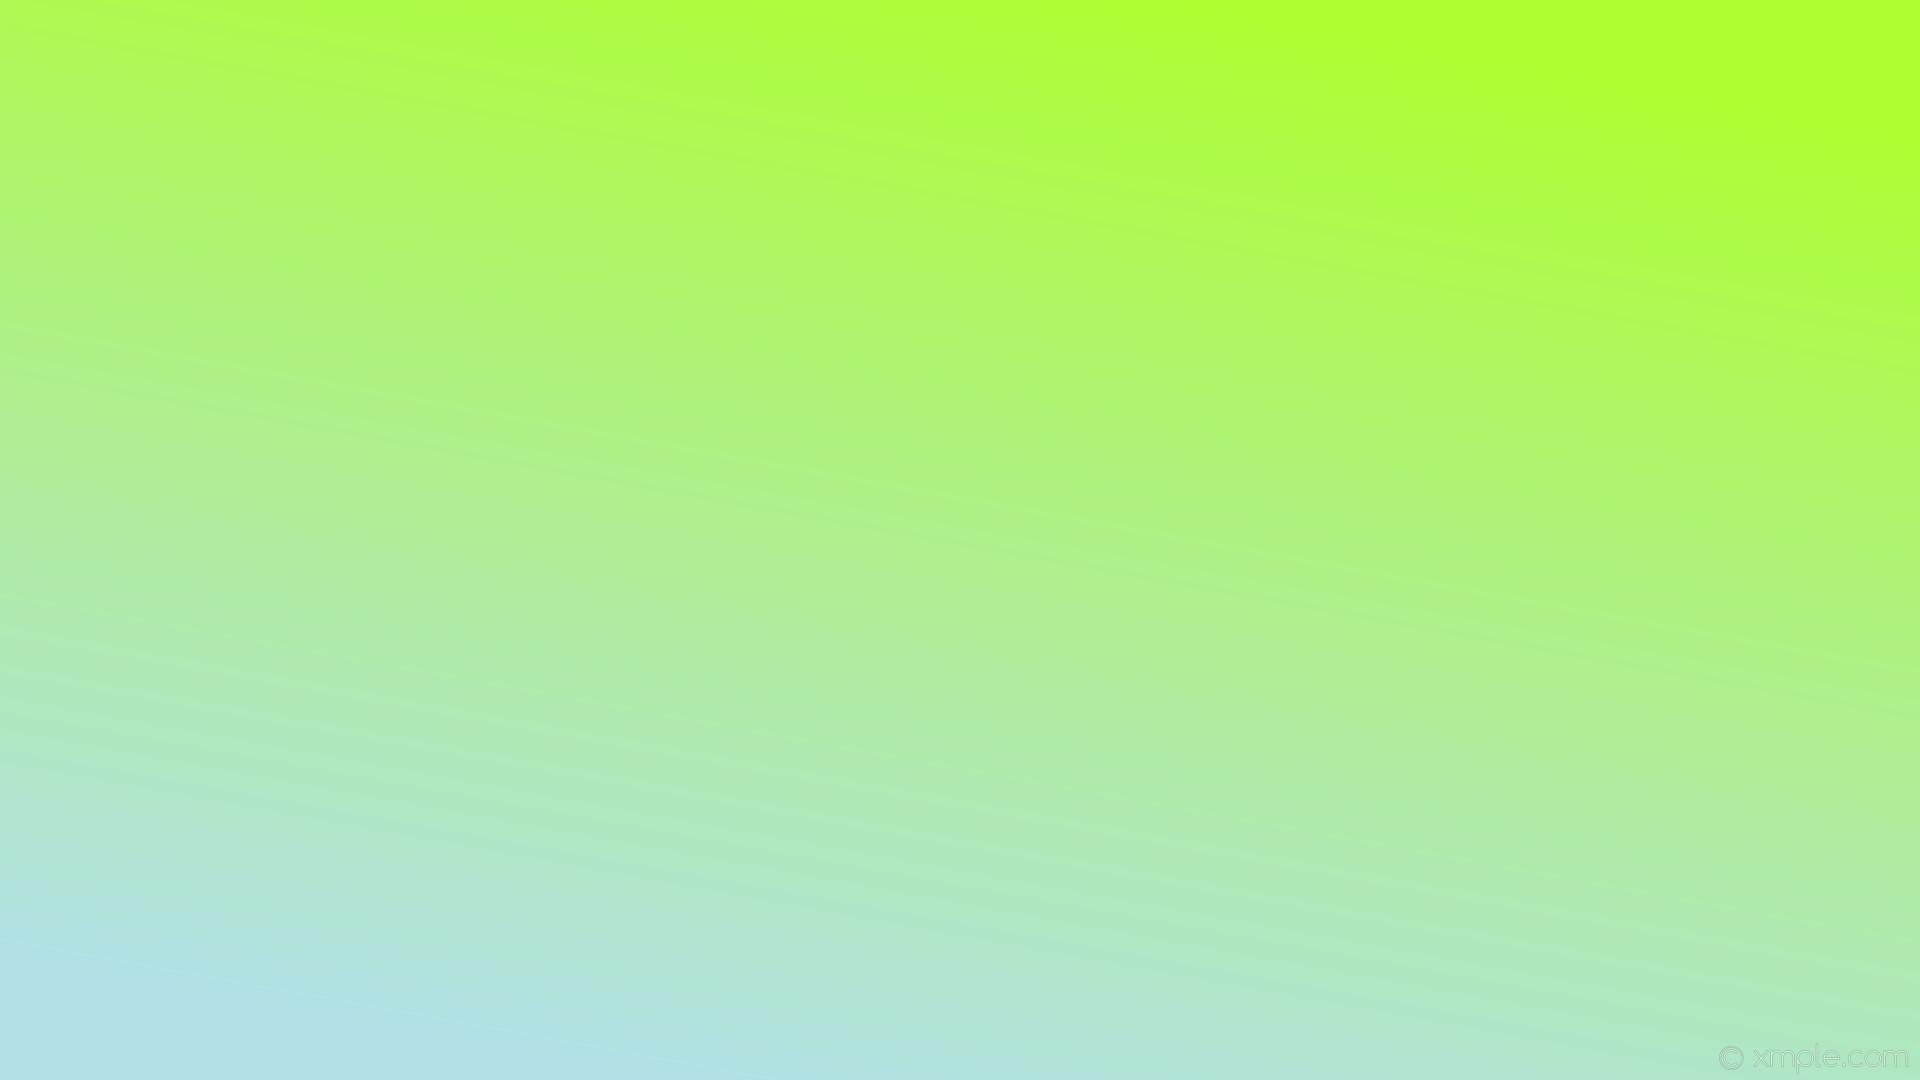 wallpaper green linear blue gradient powder blue green yellow #b0e0e6  #adff2f 240°